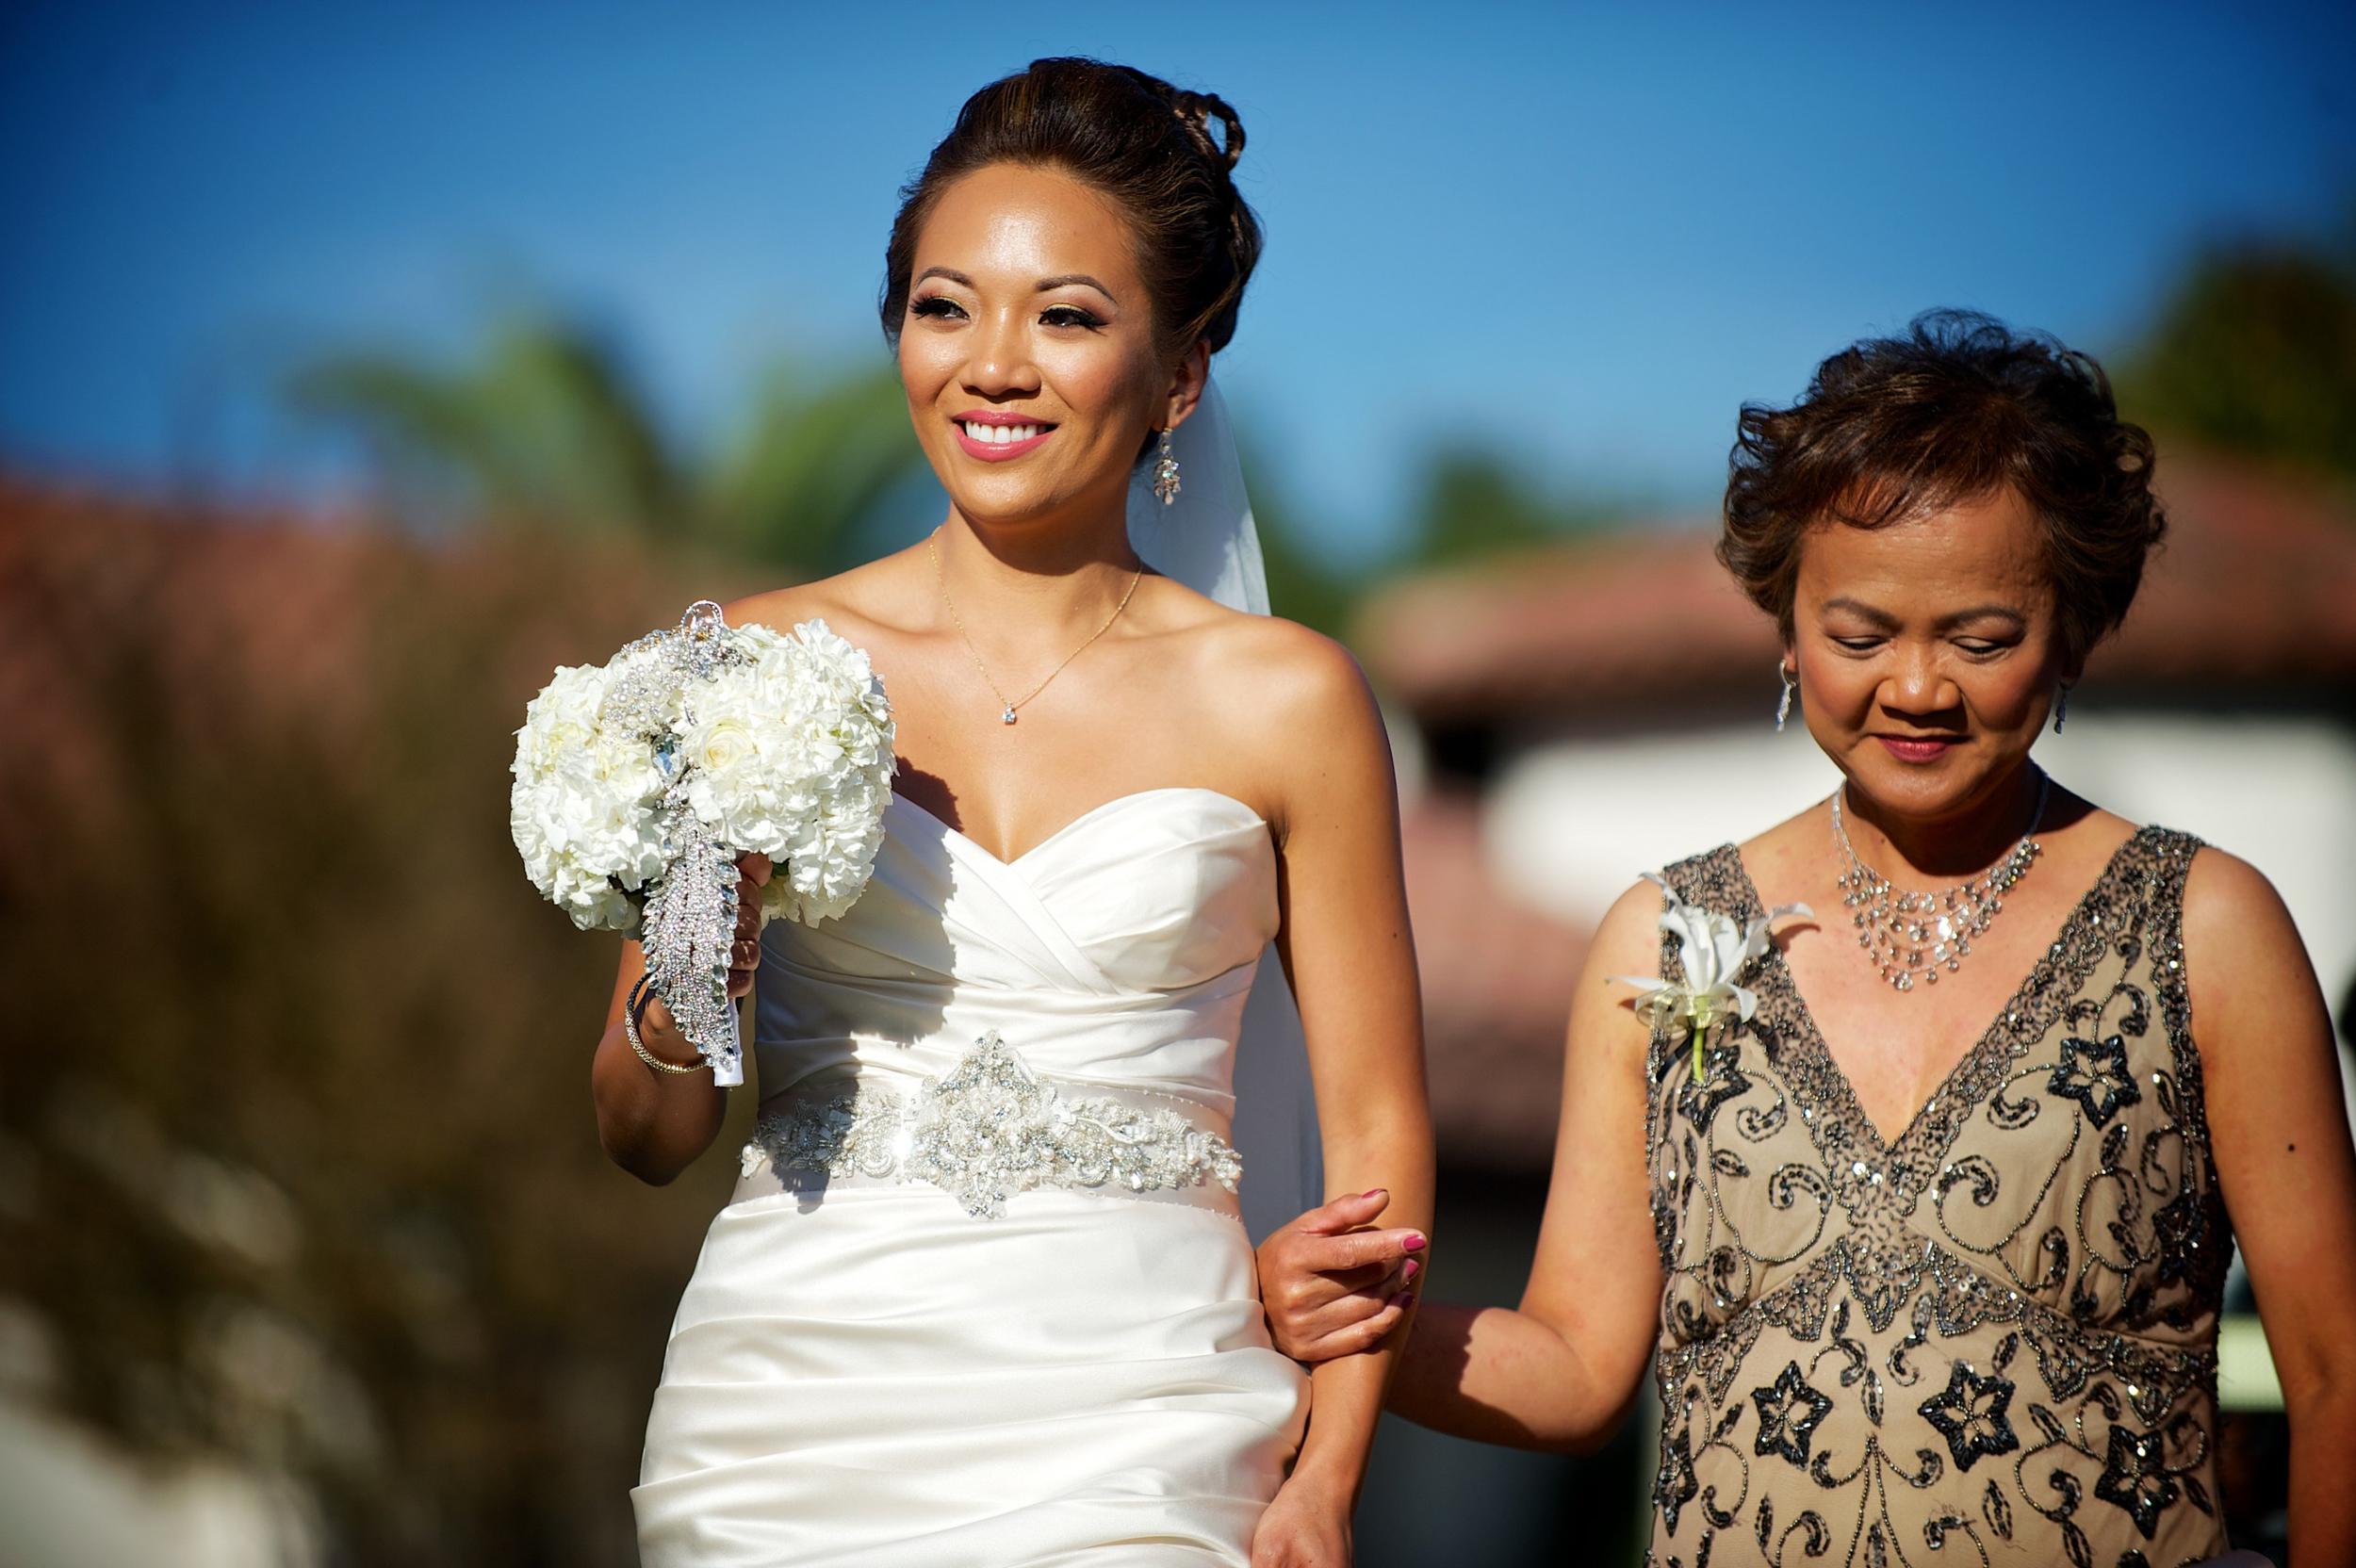 bernadus-lodge-wedding-carmel 9.jpg